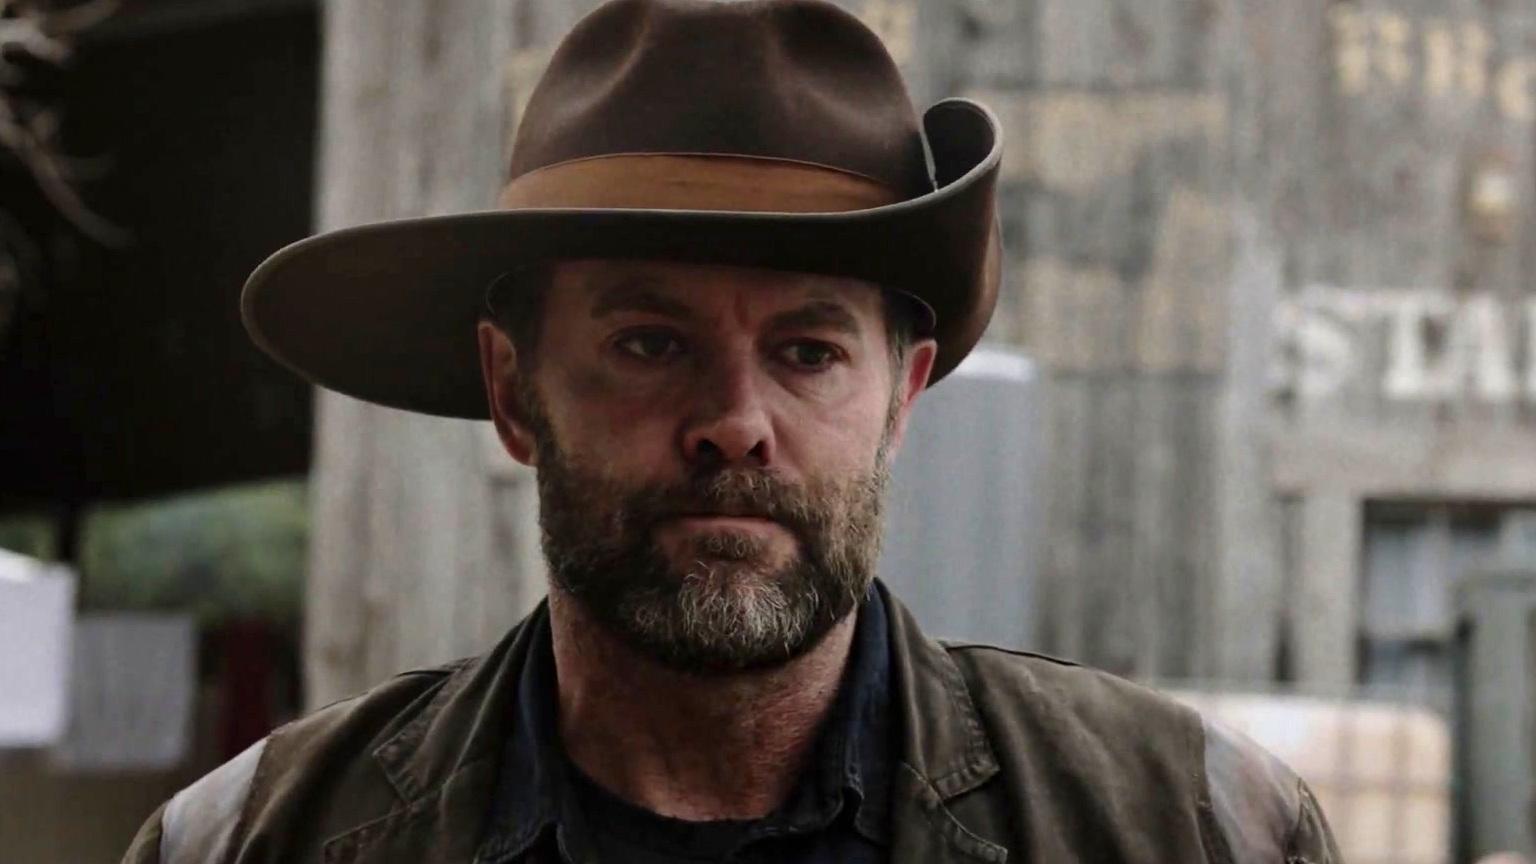 Fear The Walking Dead: John Unleashes His Fury